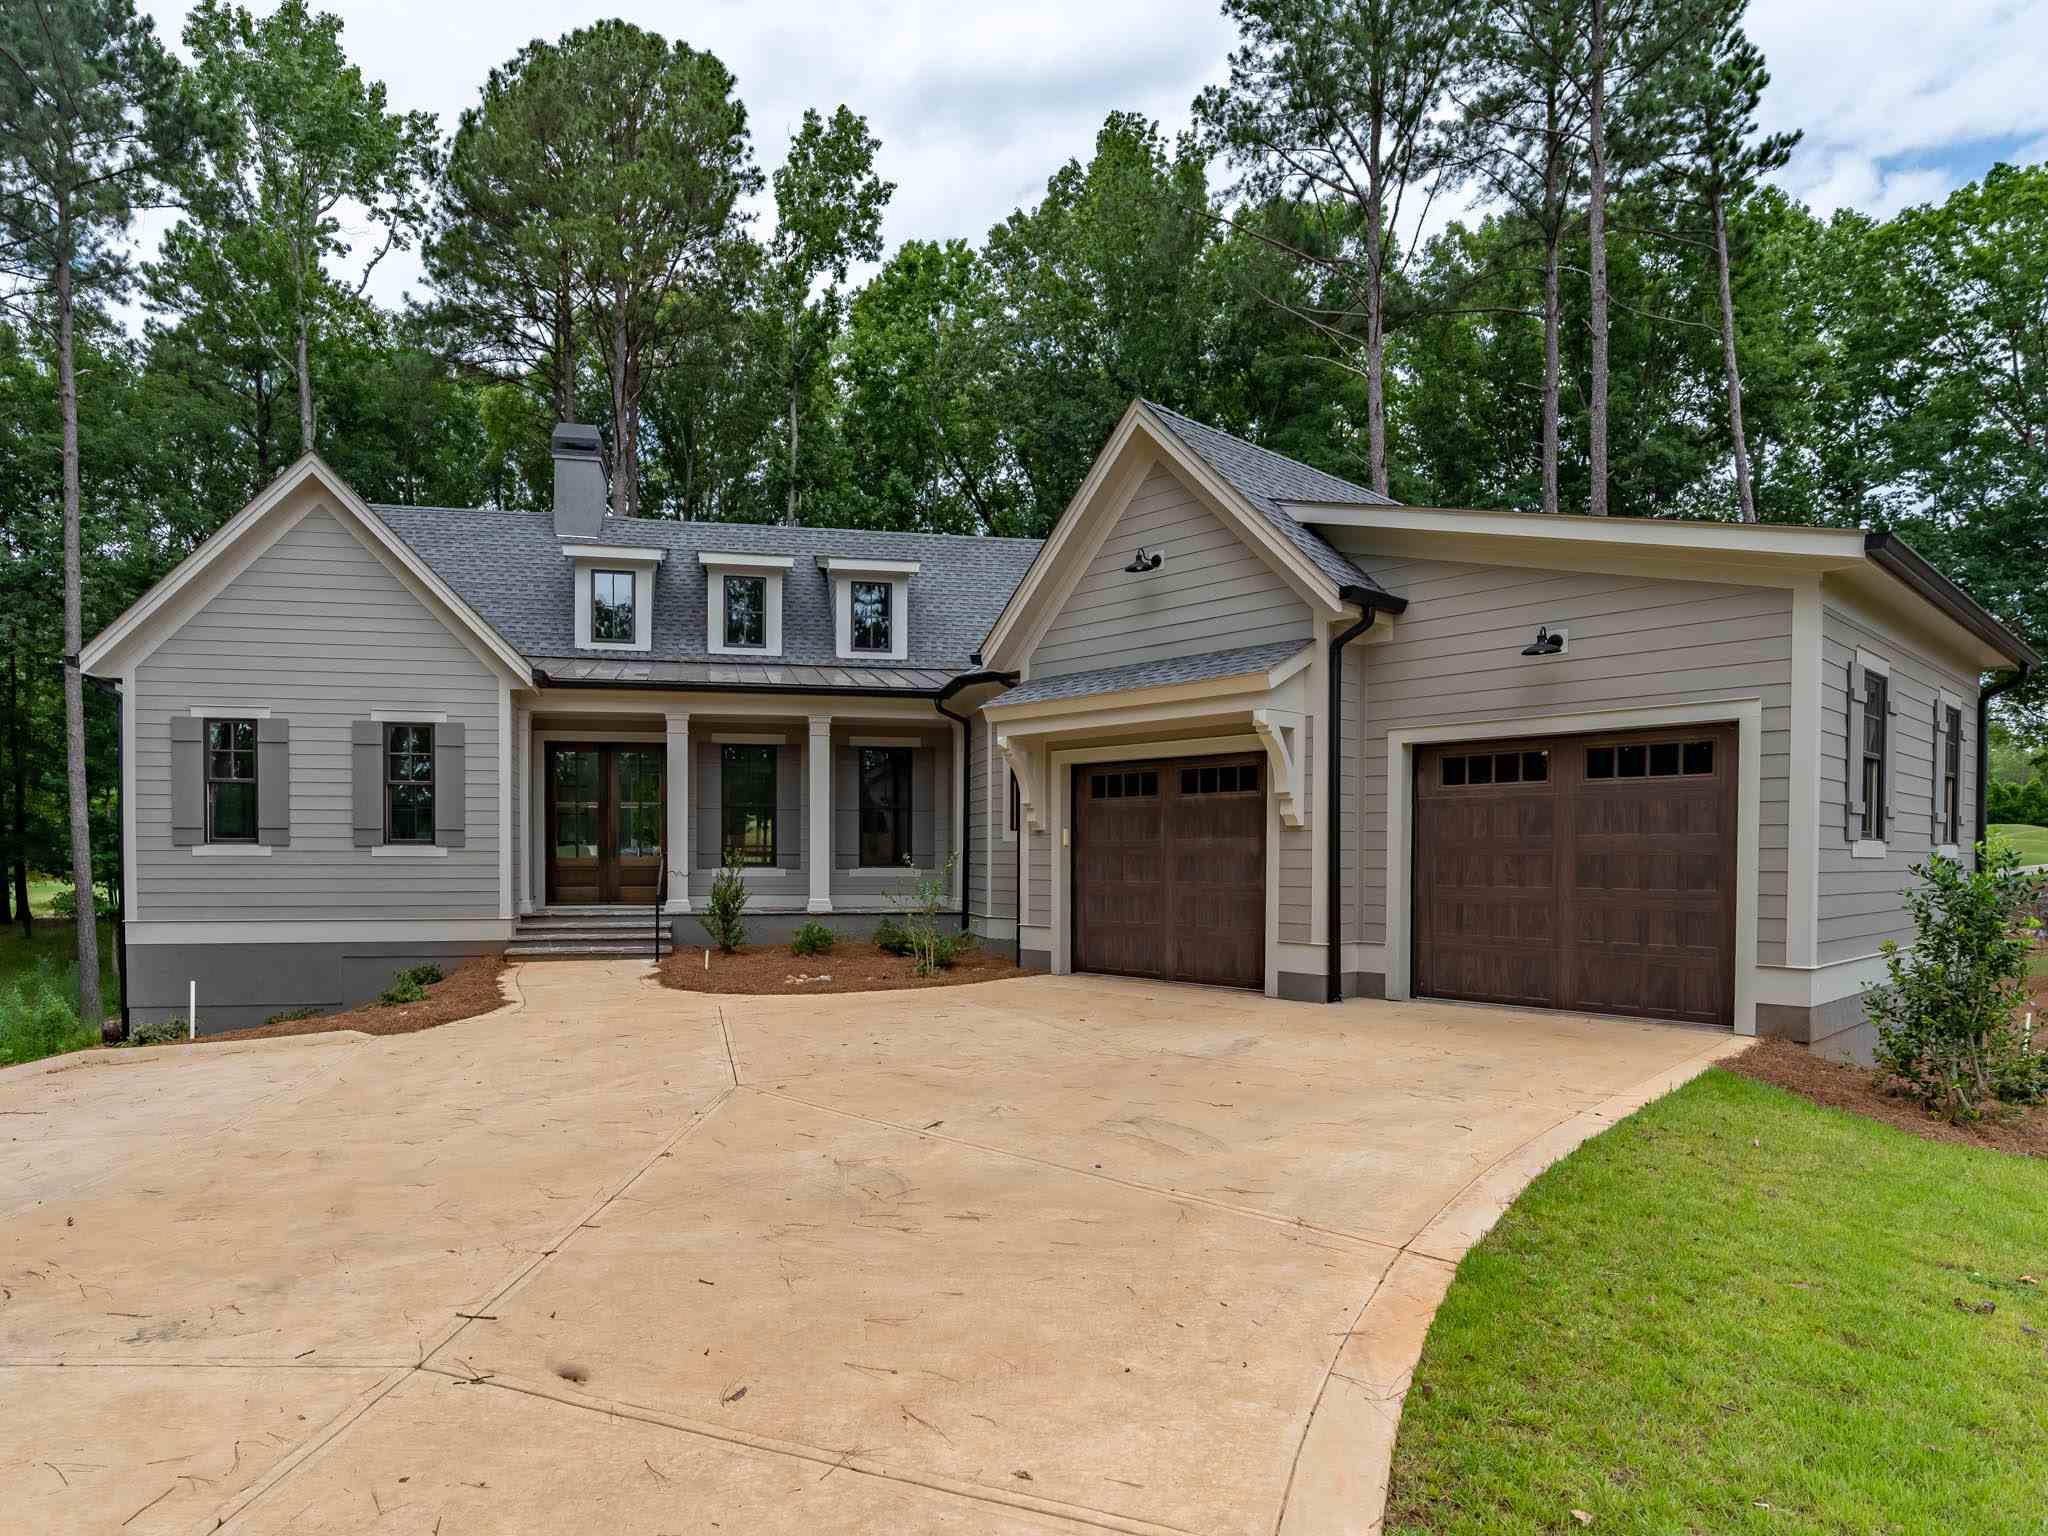 1170 LONG COVE DRIVE, Lake Oconee Reynolds Landing in Greene County, GA 30642 Home for Sale